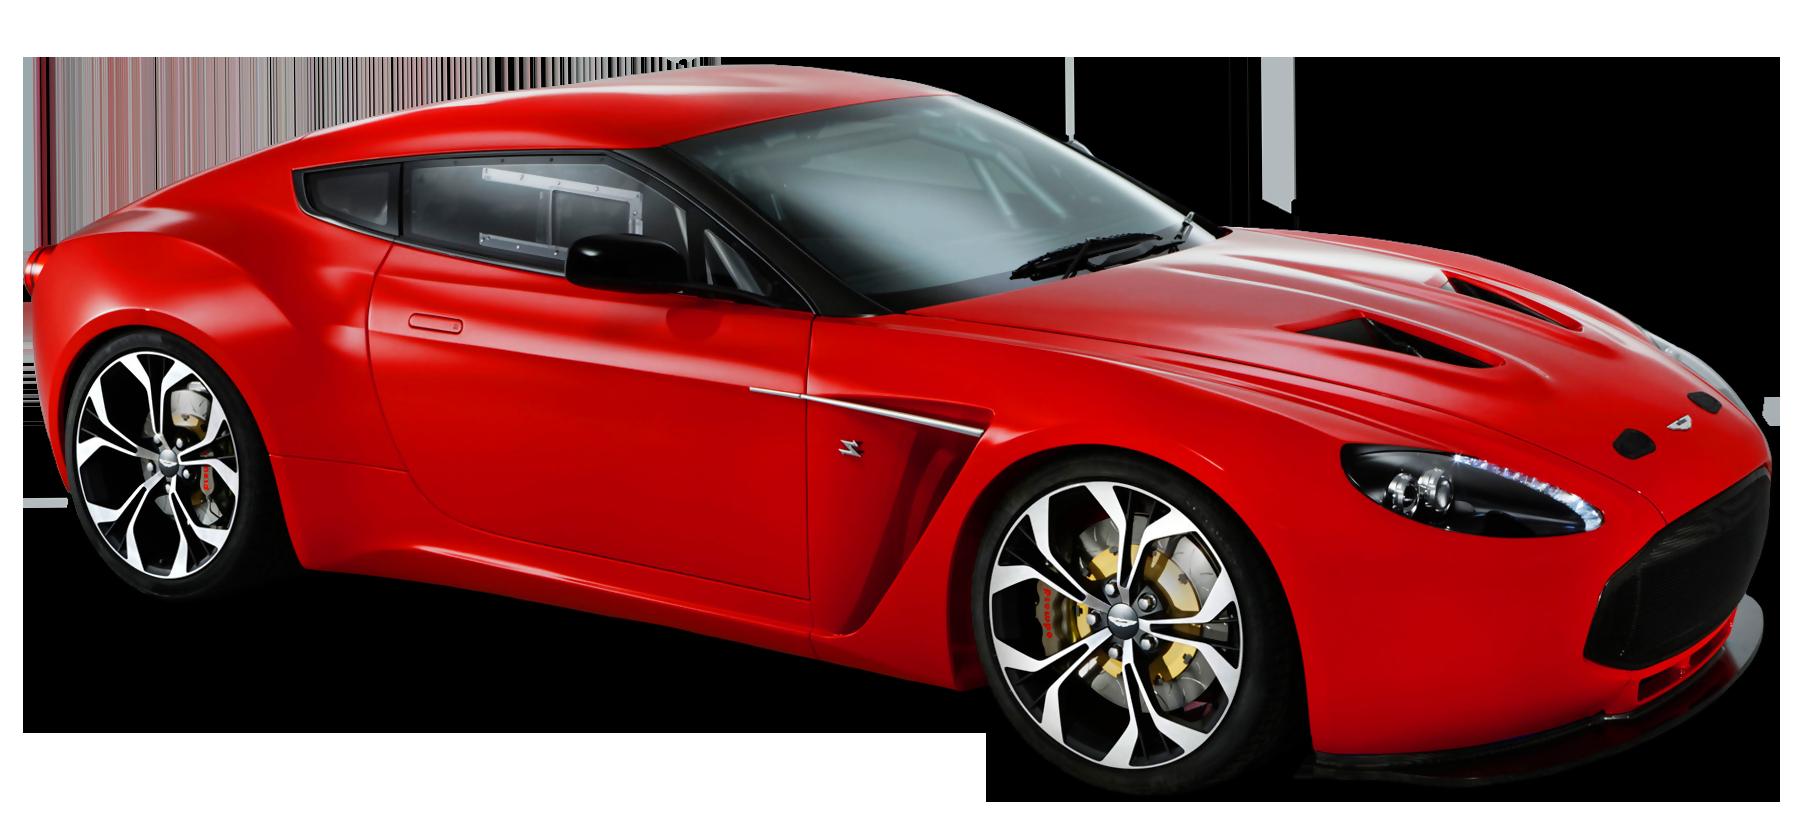 Aston Martin Car PNG Car Clipart Best WEB Clipart ...